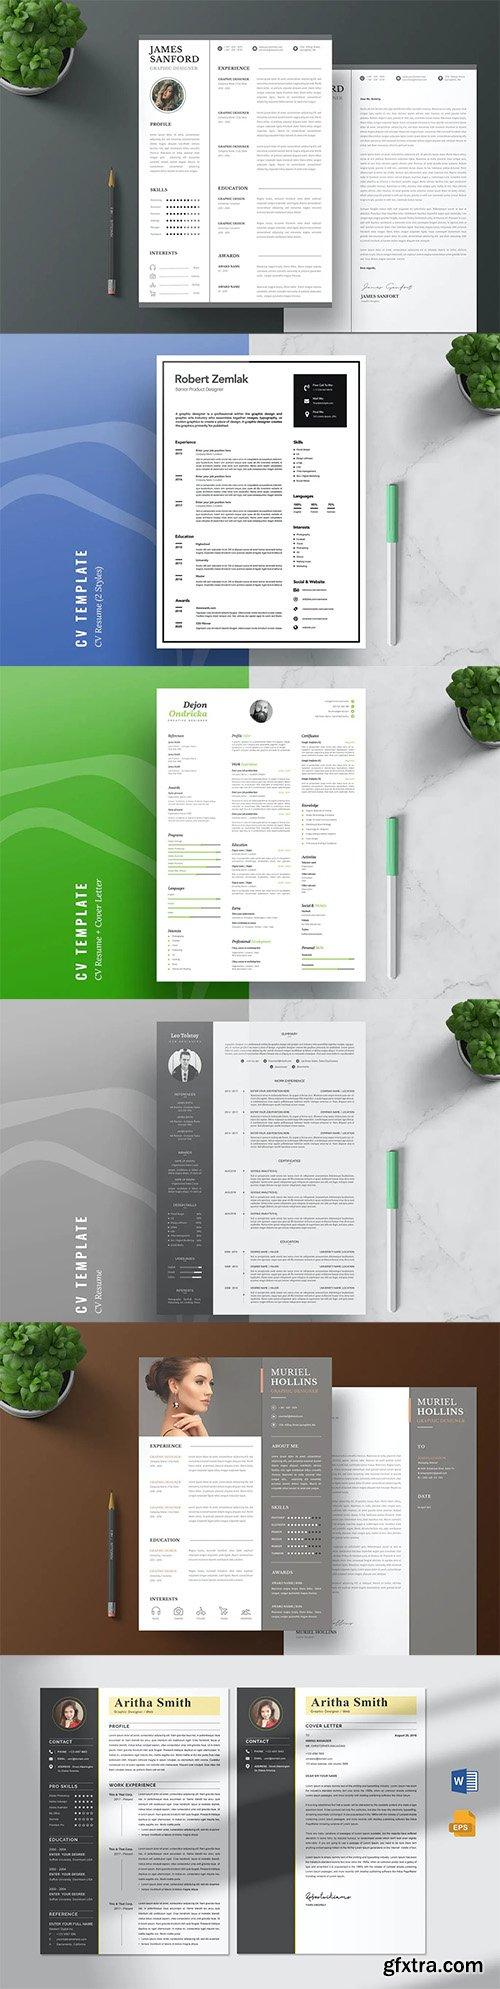 CV Resume Templates Pack